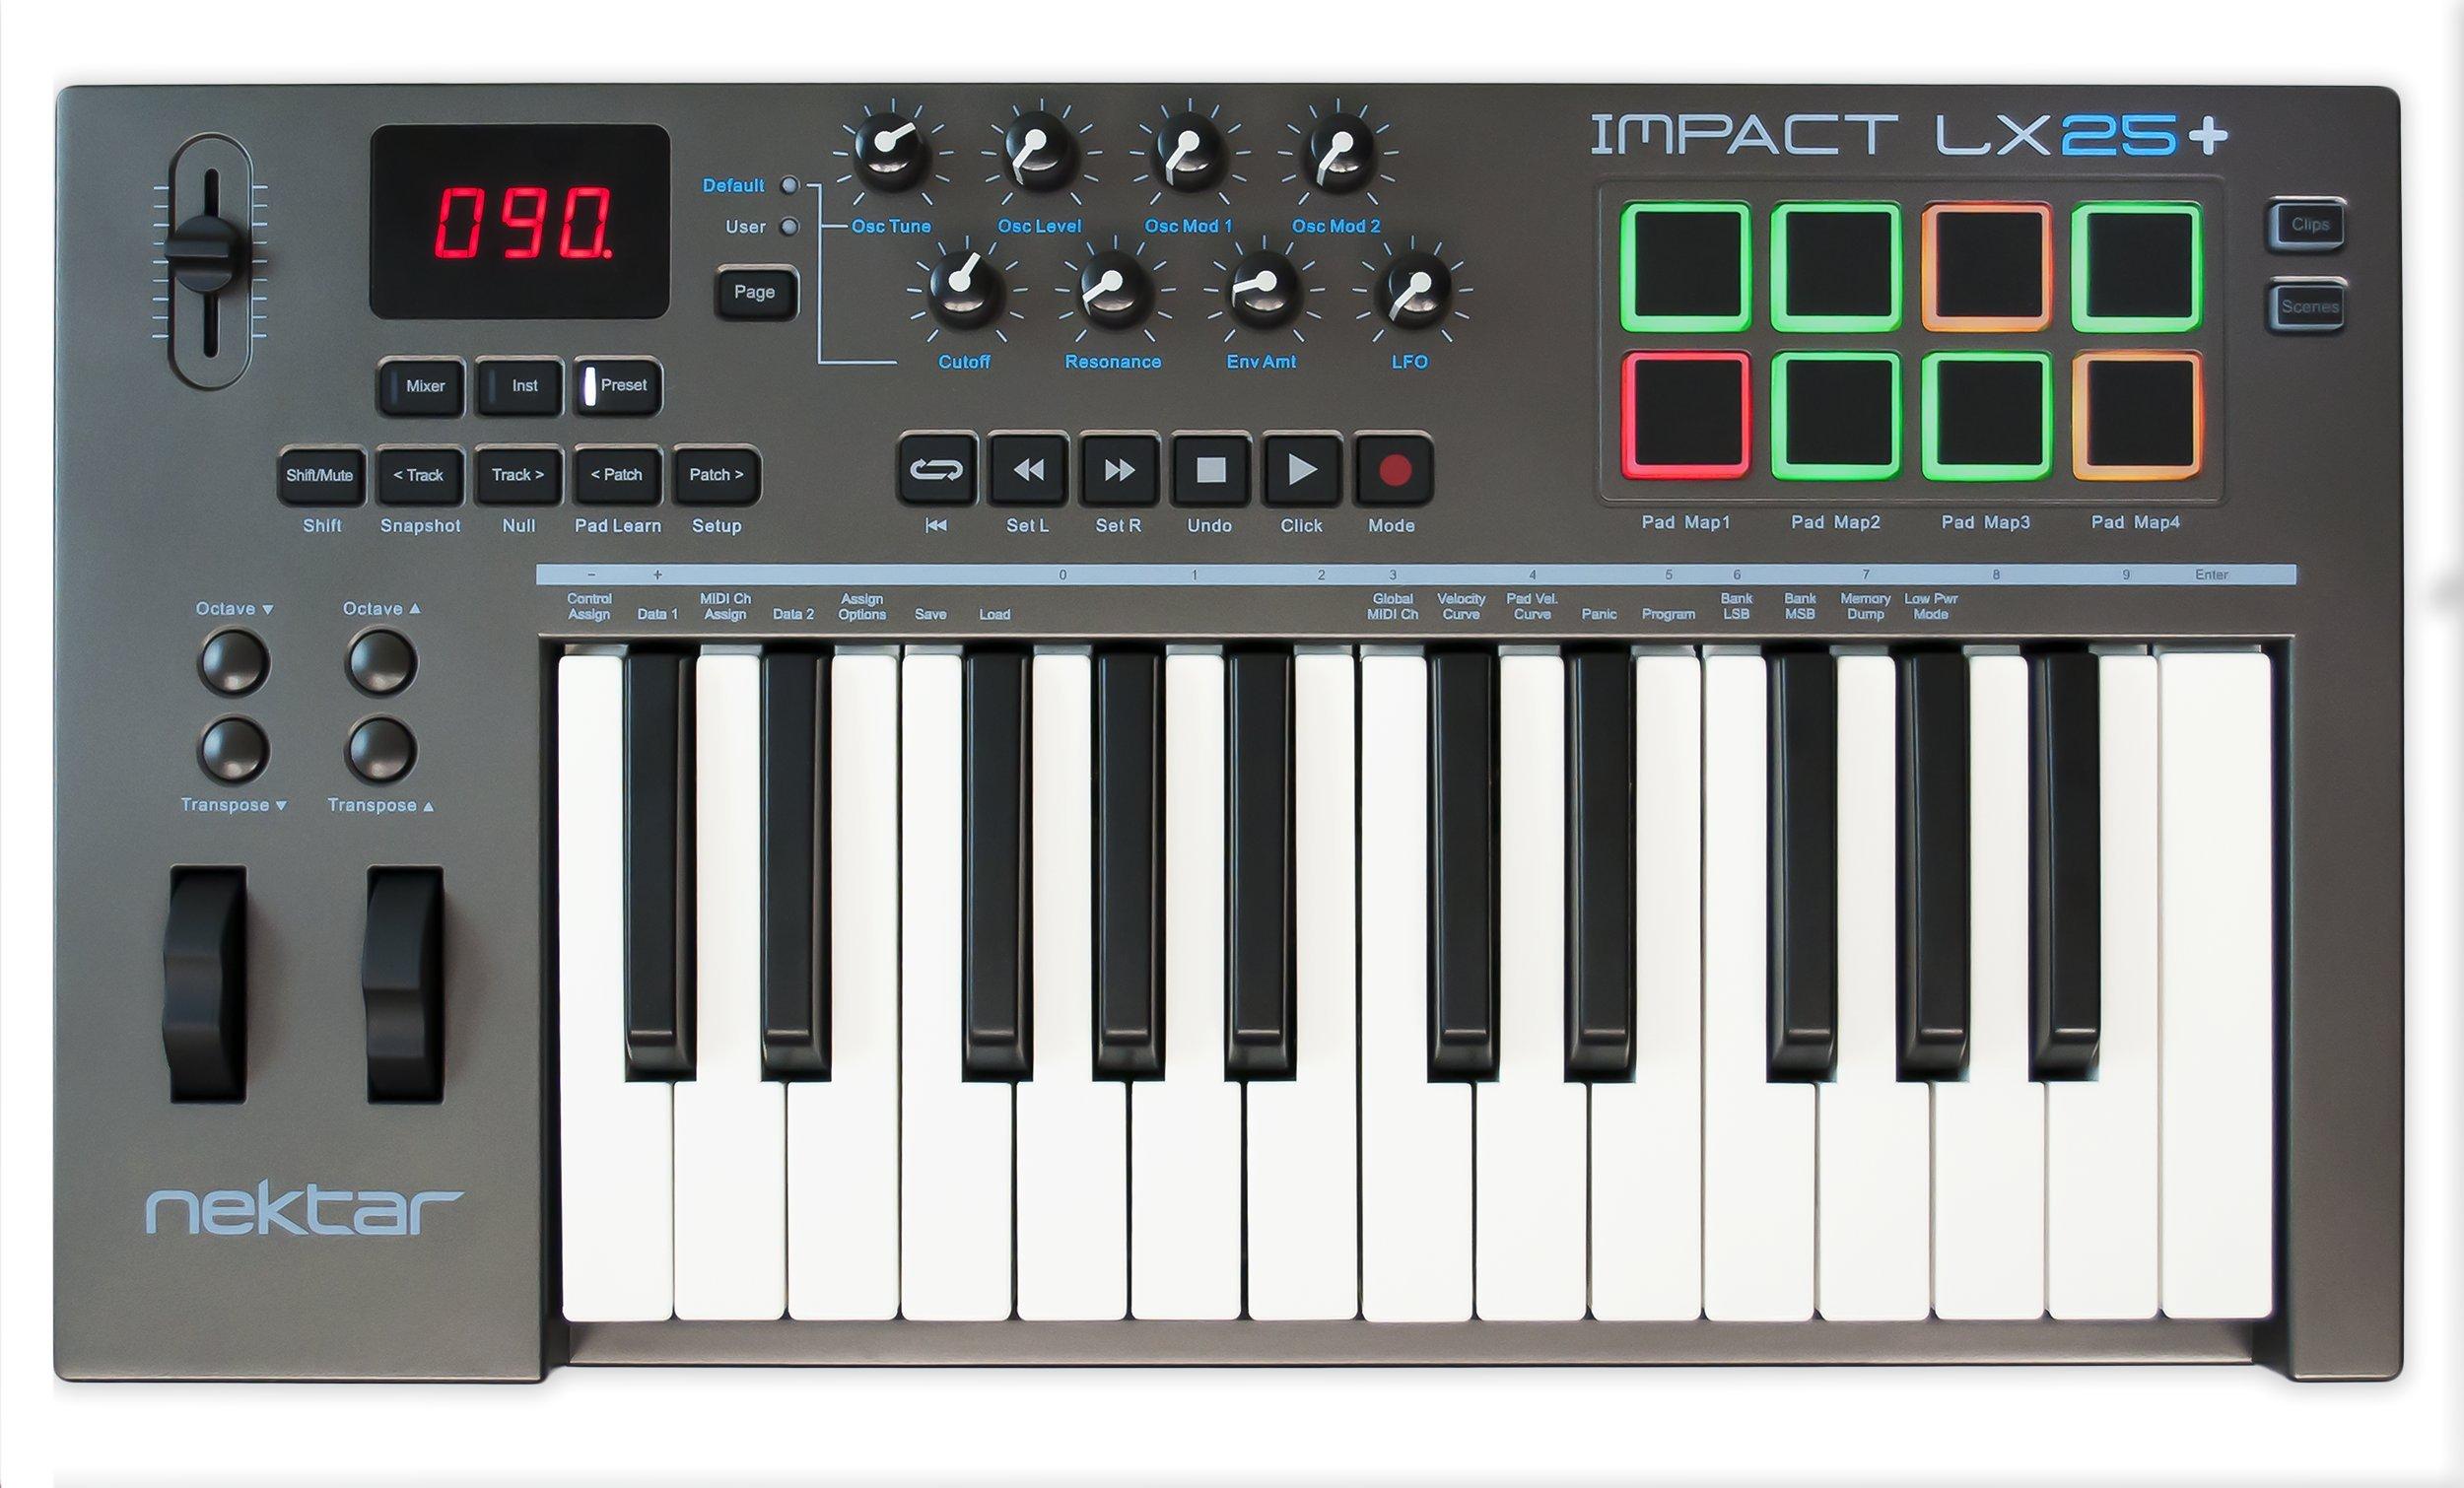 Nektar IMPACT LX25+ MIDI Controller by Nektar